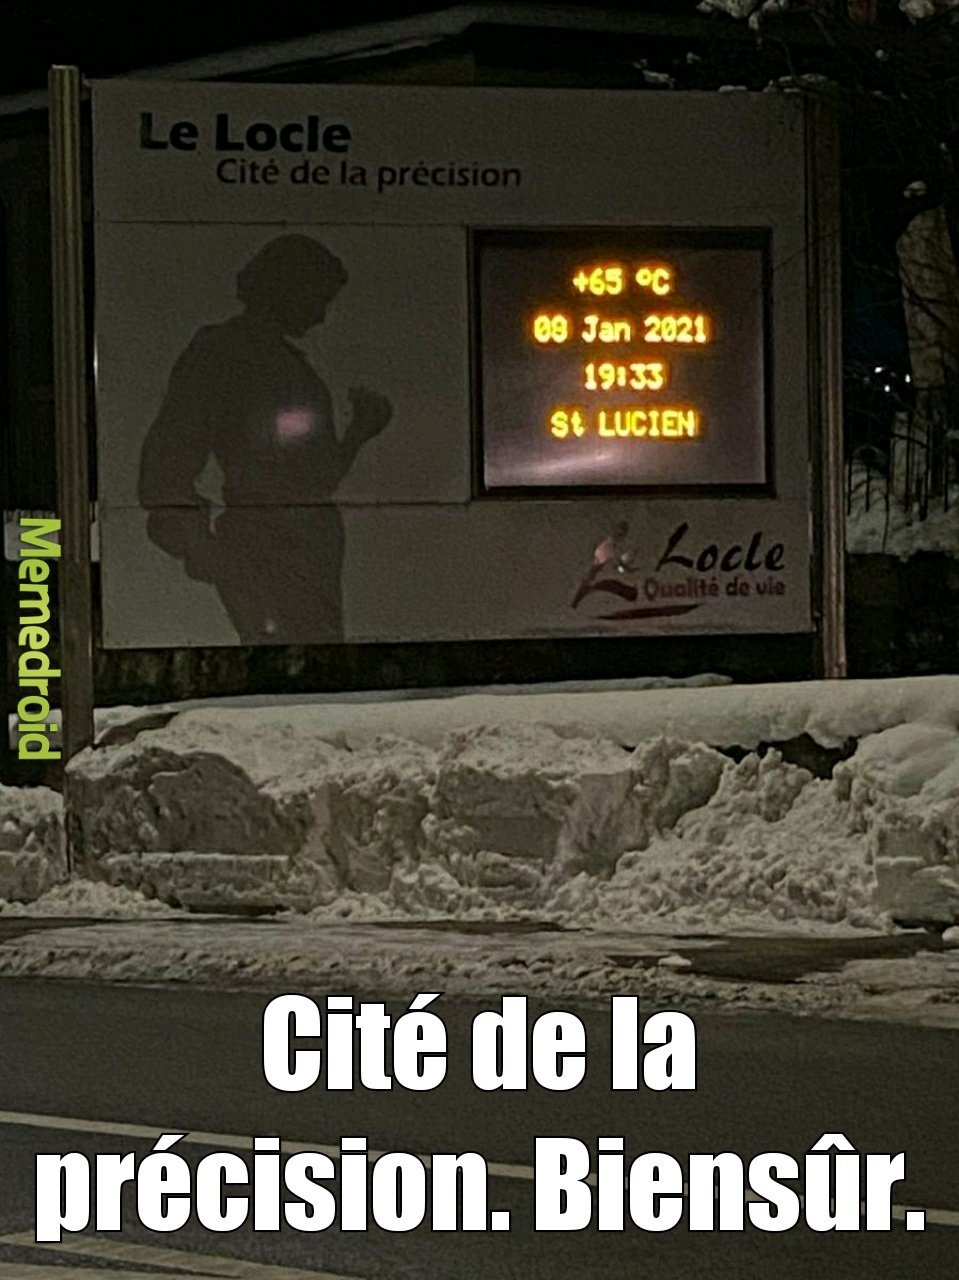 Regardez la température - meme